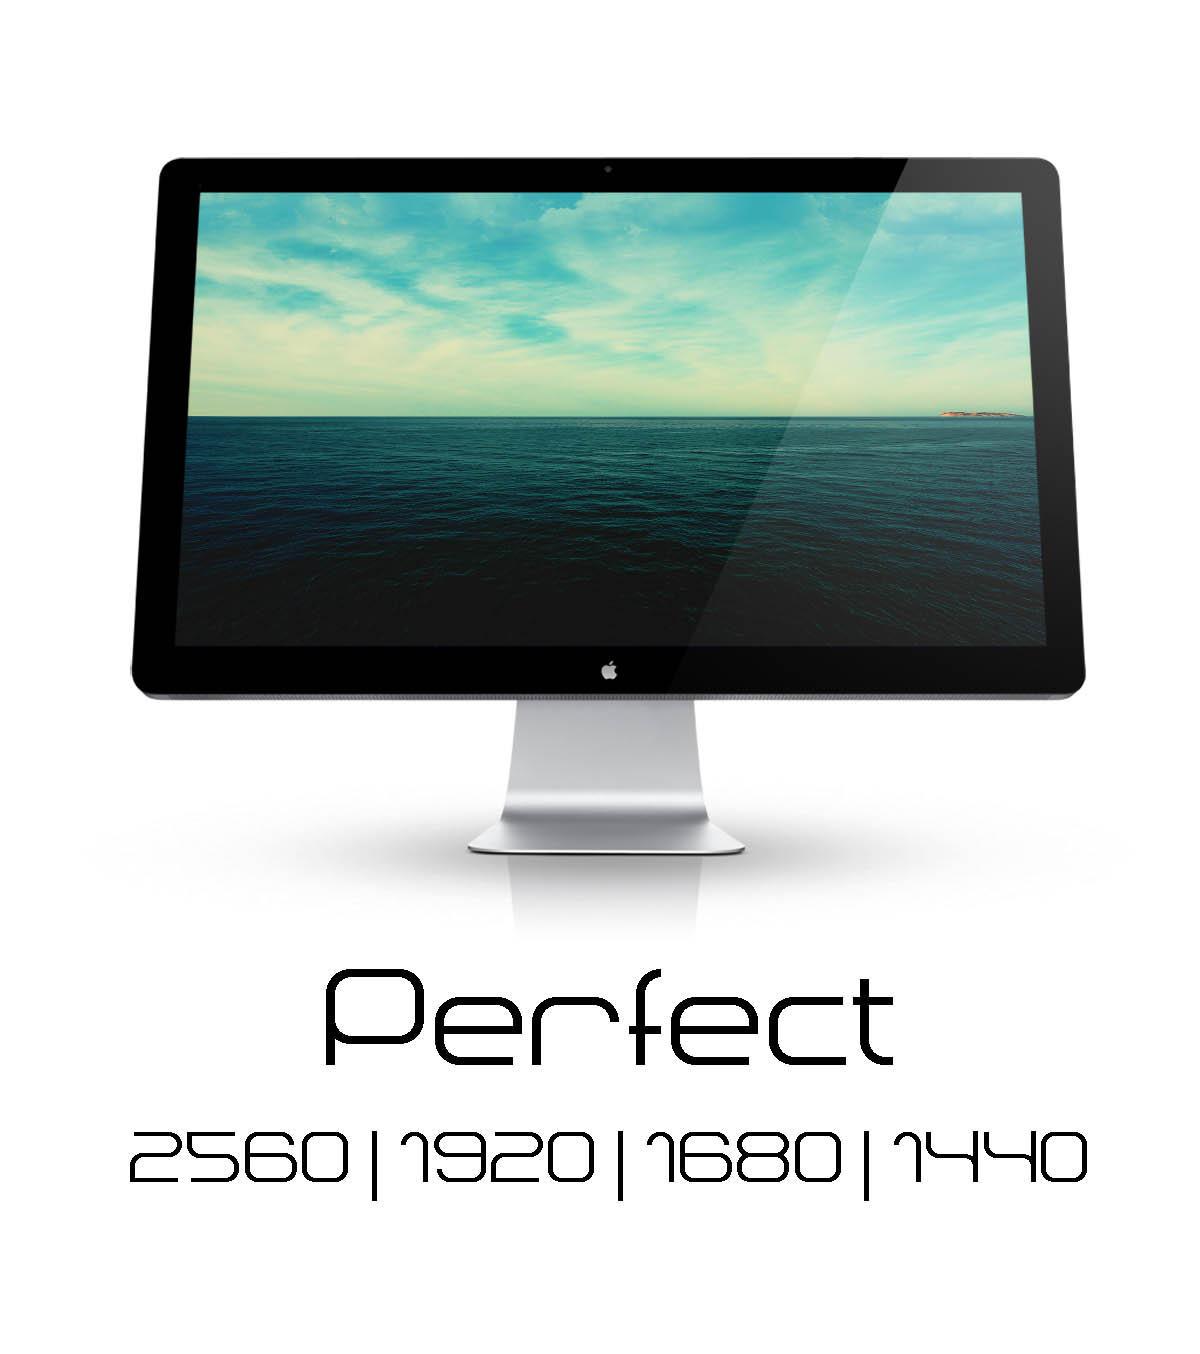 Perfect by Sashaa812